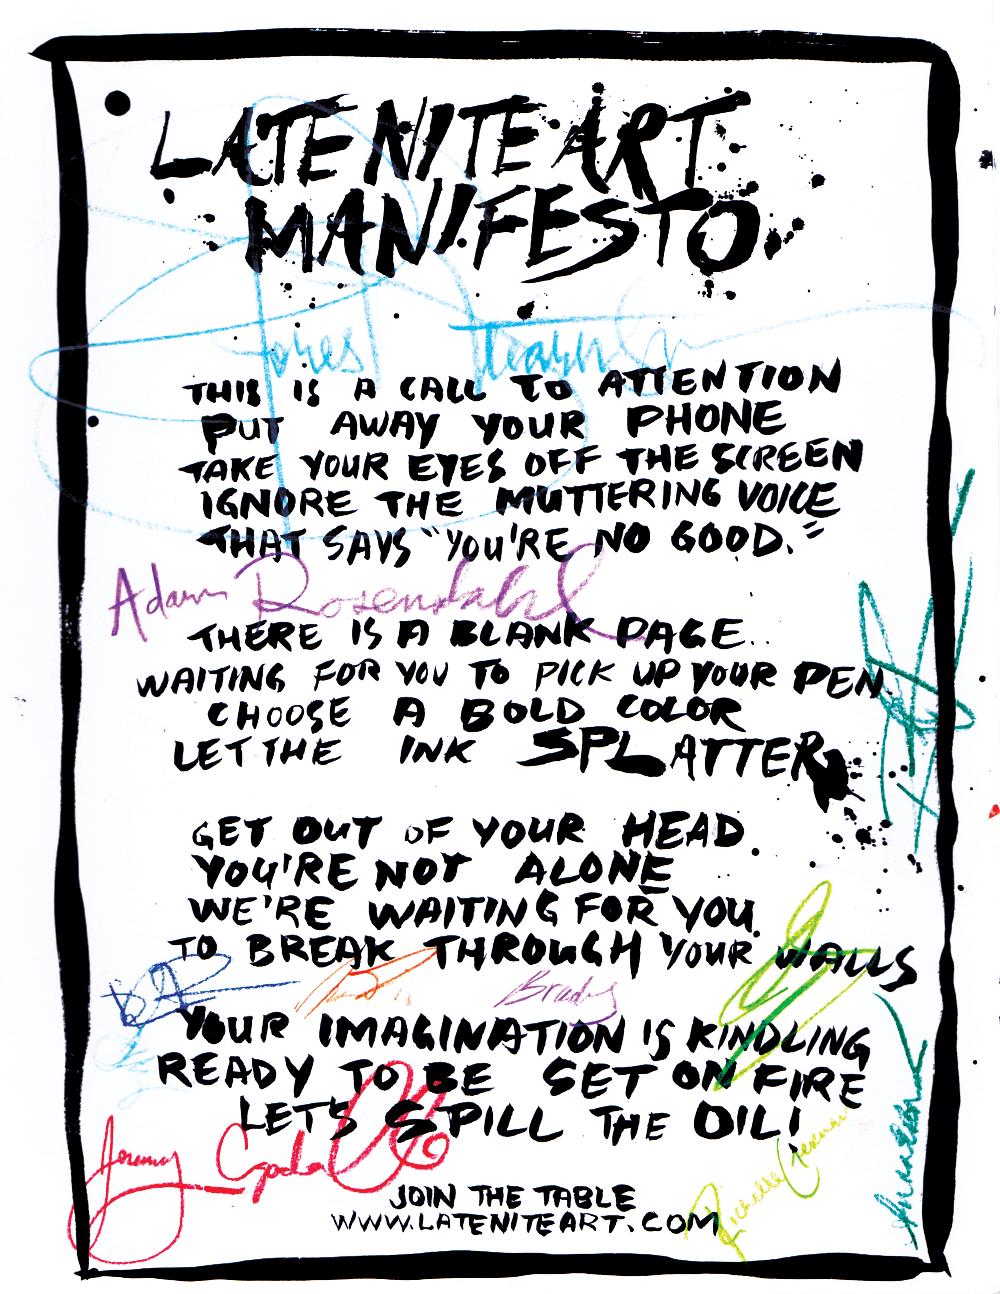 late-nite-art-manifesto.png